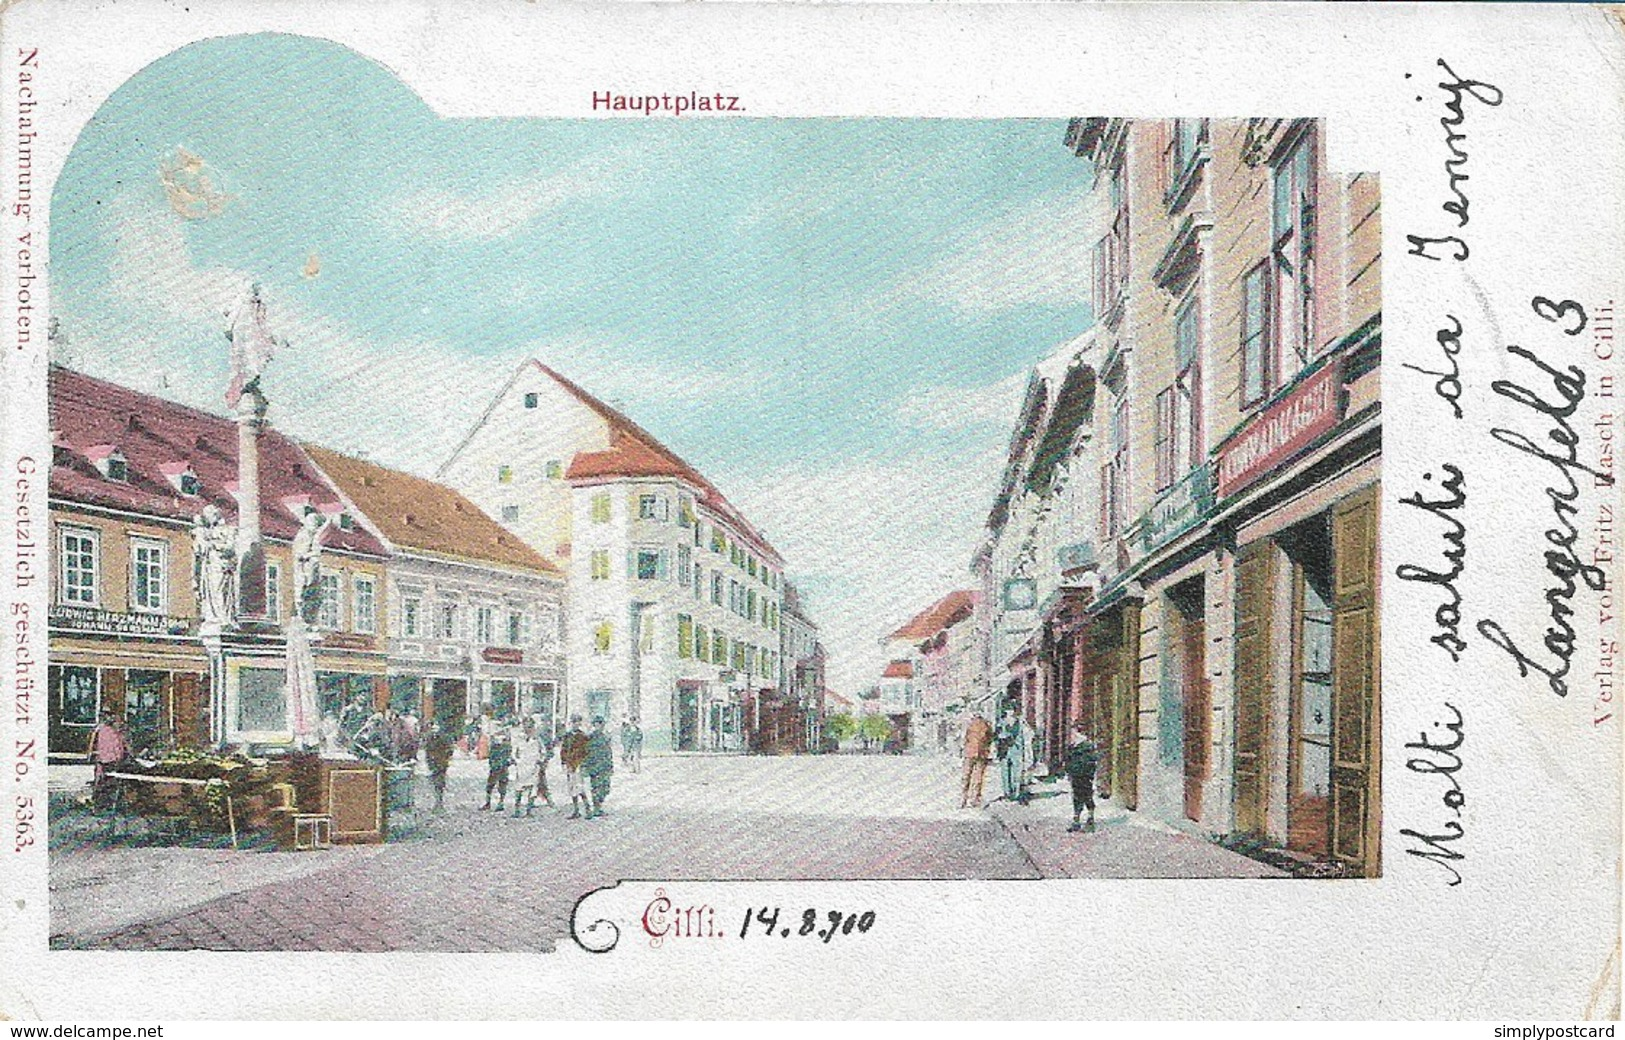 OLD POSTCARD AUSTRIA SLOVENIA - CILLI - HAUPTPLATZ - VIAGGIATA 14 AGOSTO 1900 - P38 - Eslovenia